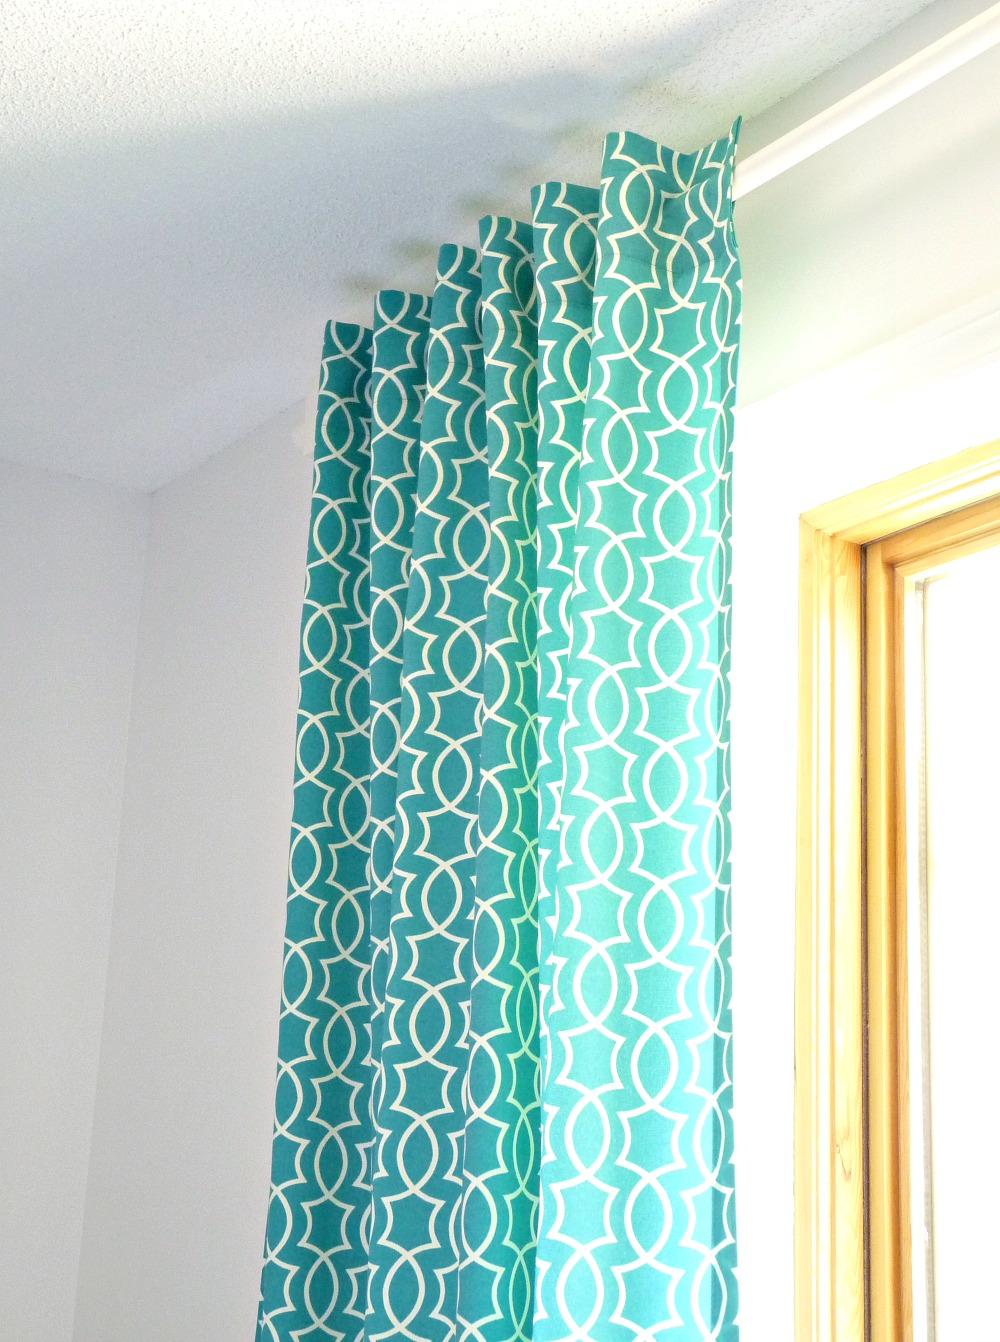 Diy Back Tab Curtain Tutorial Dans Le Lakehouse